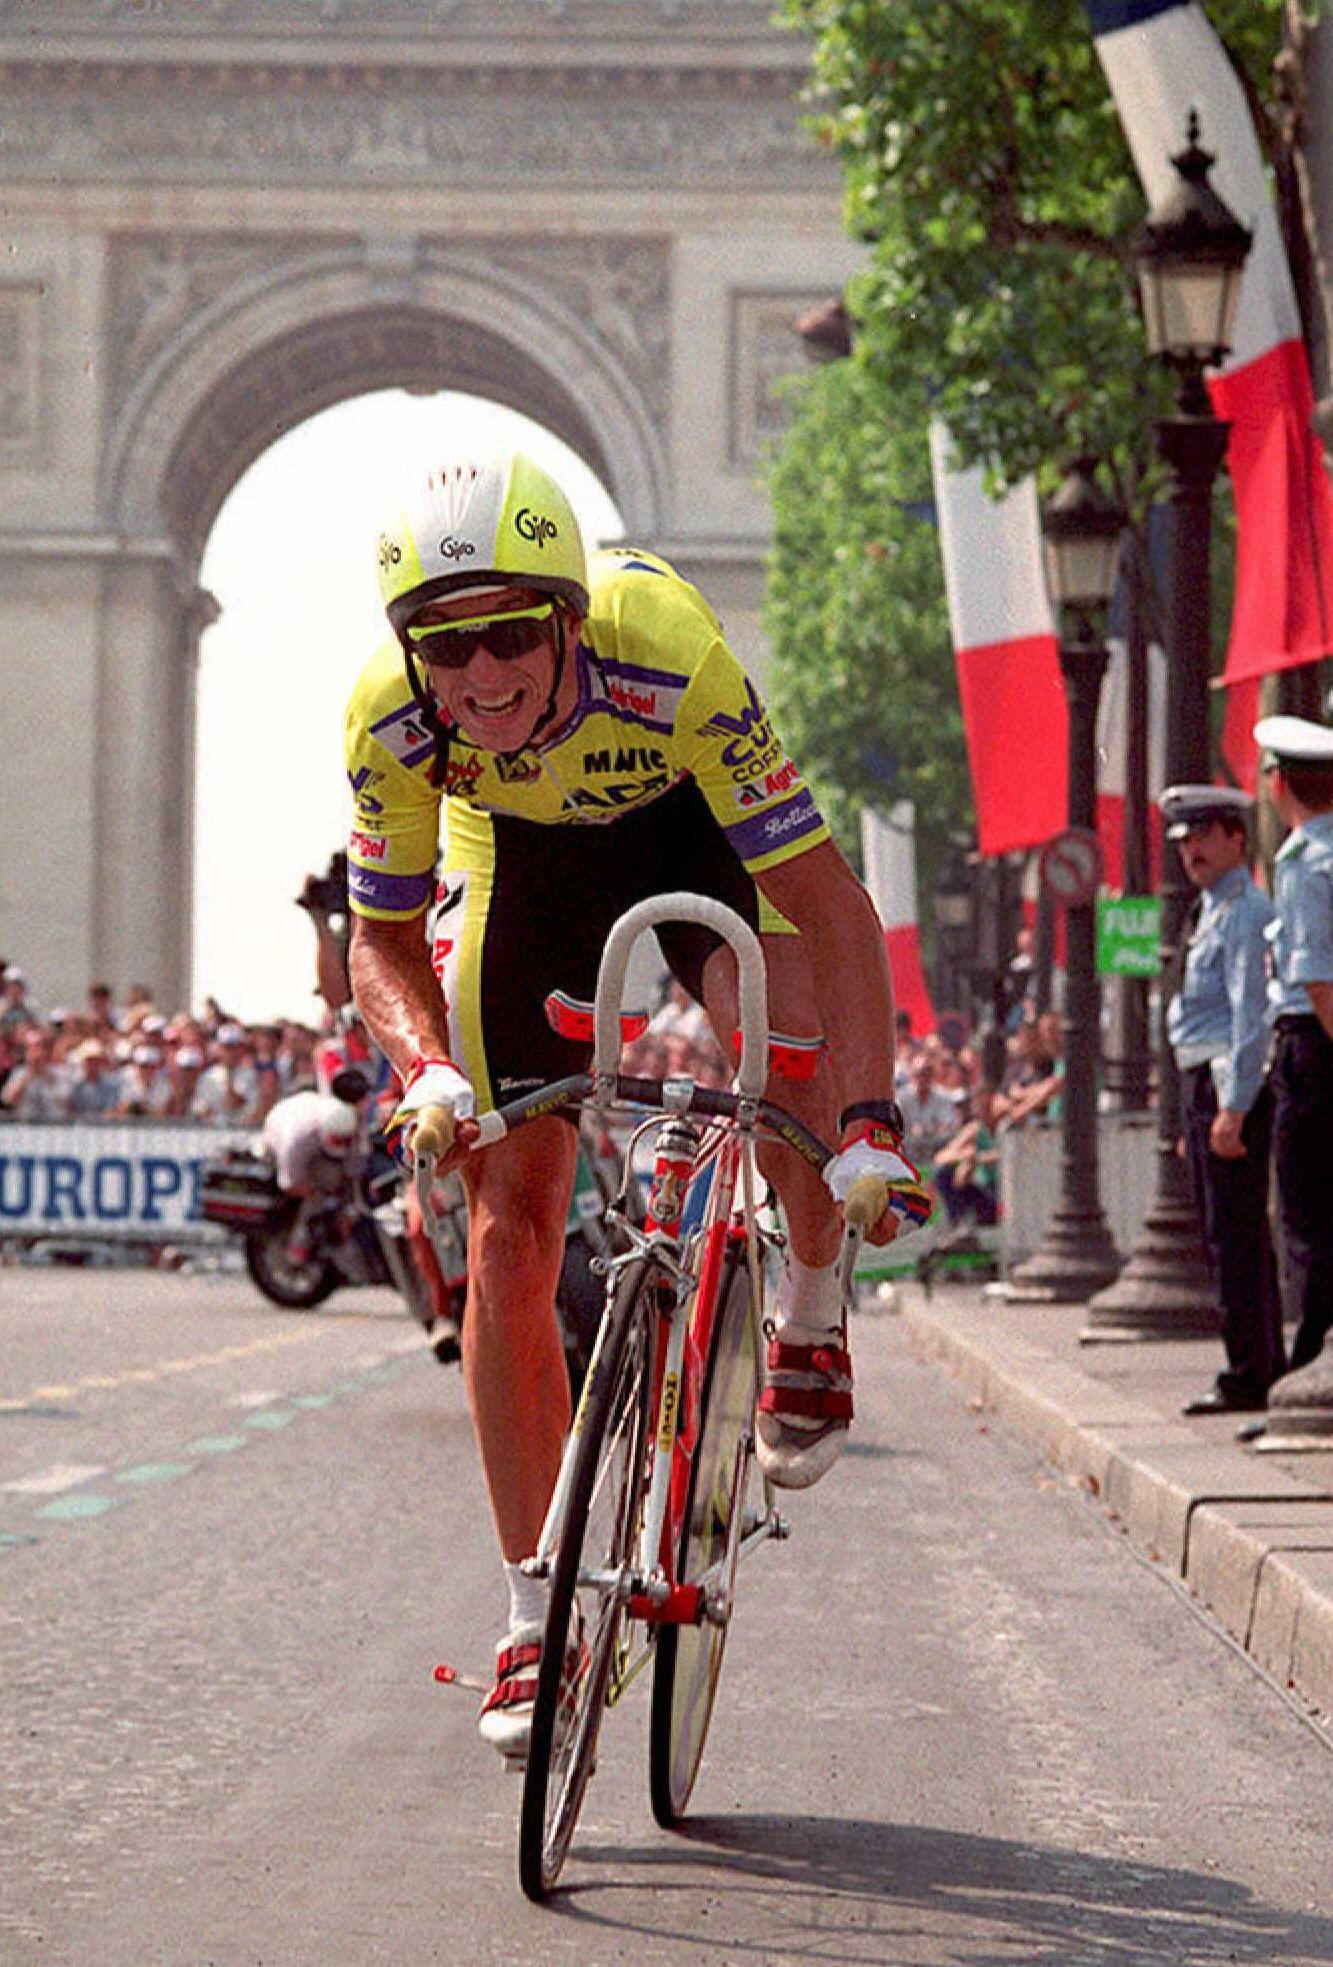 Greg Lemond S 1989 Tour De France Win The Greatest Comeback In Sports History